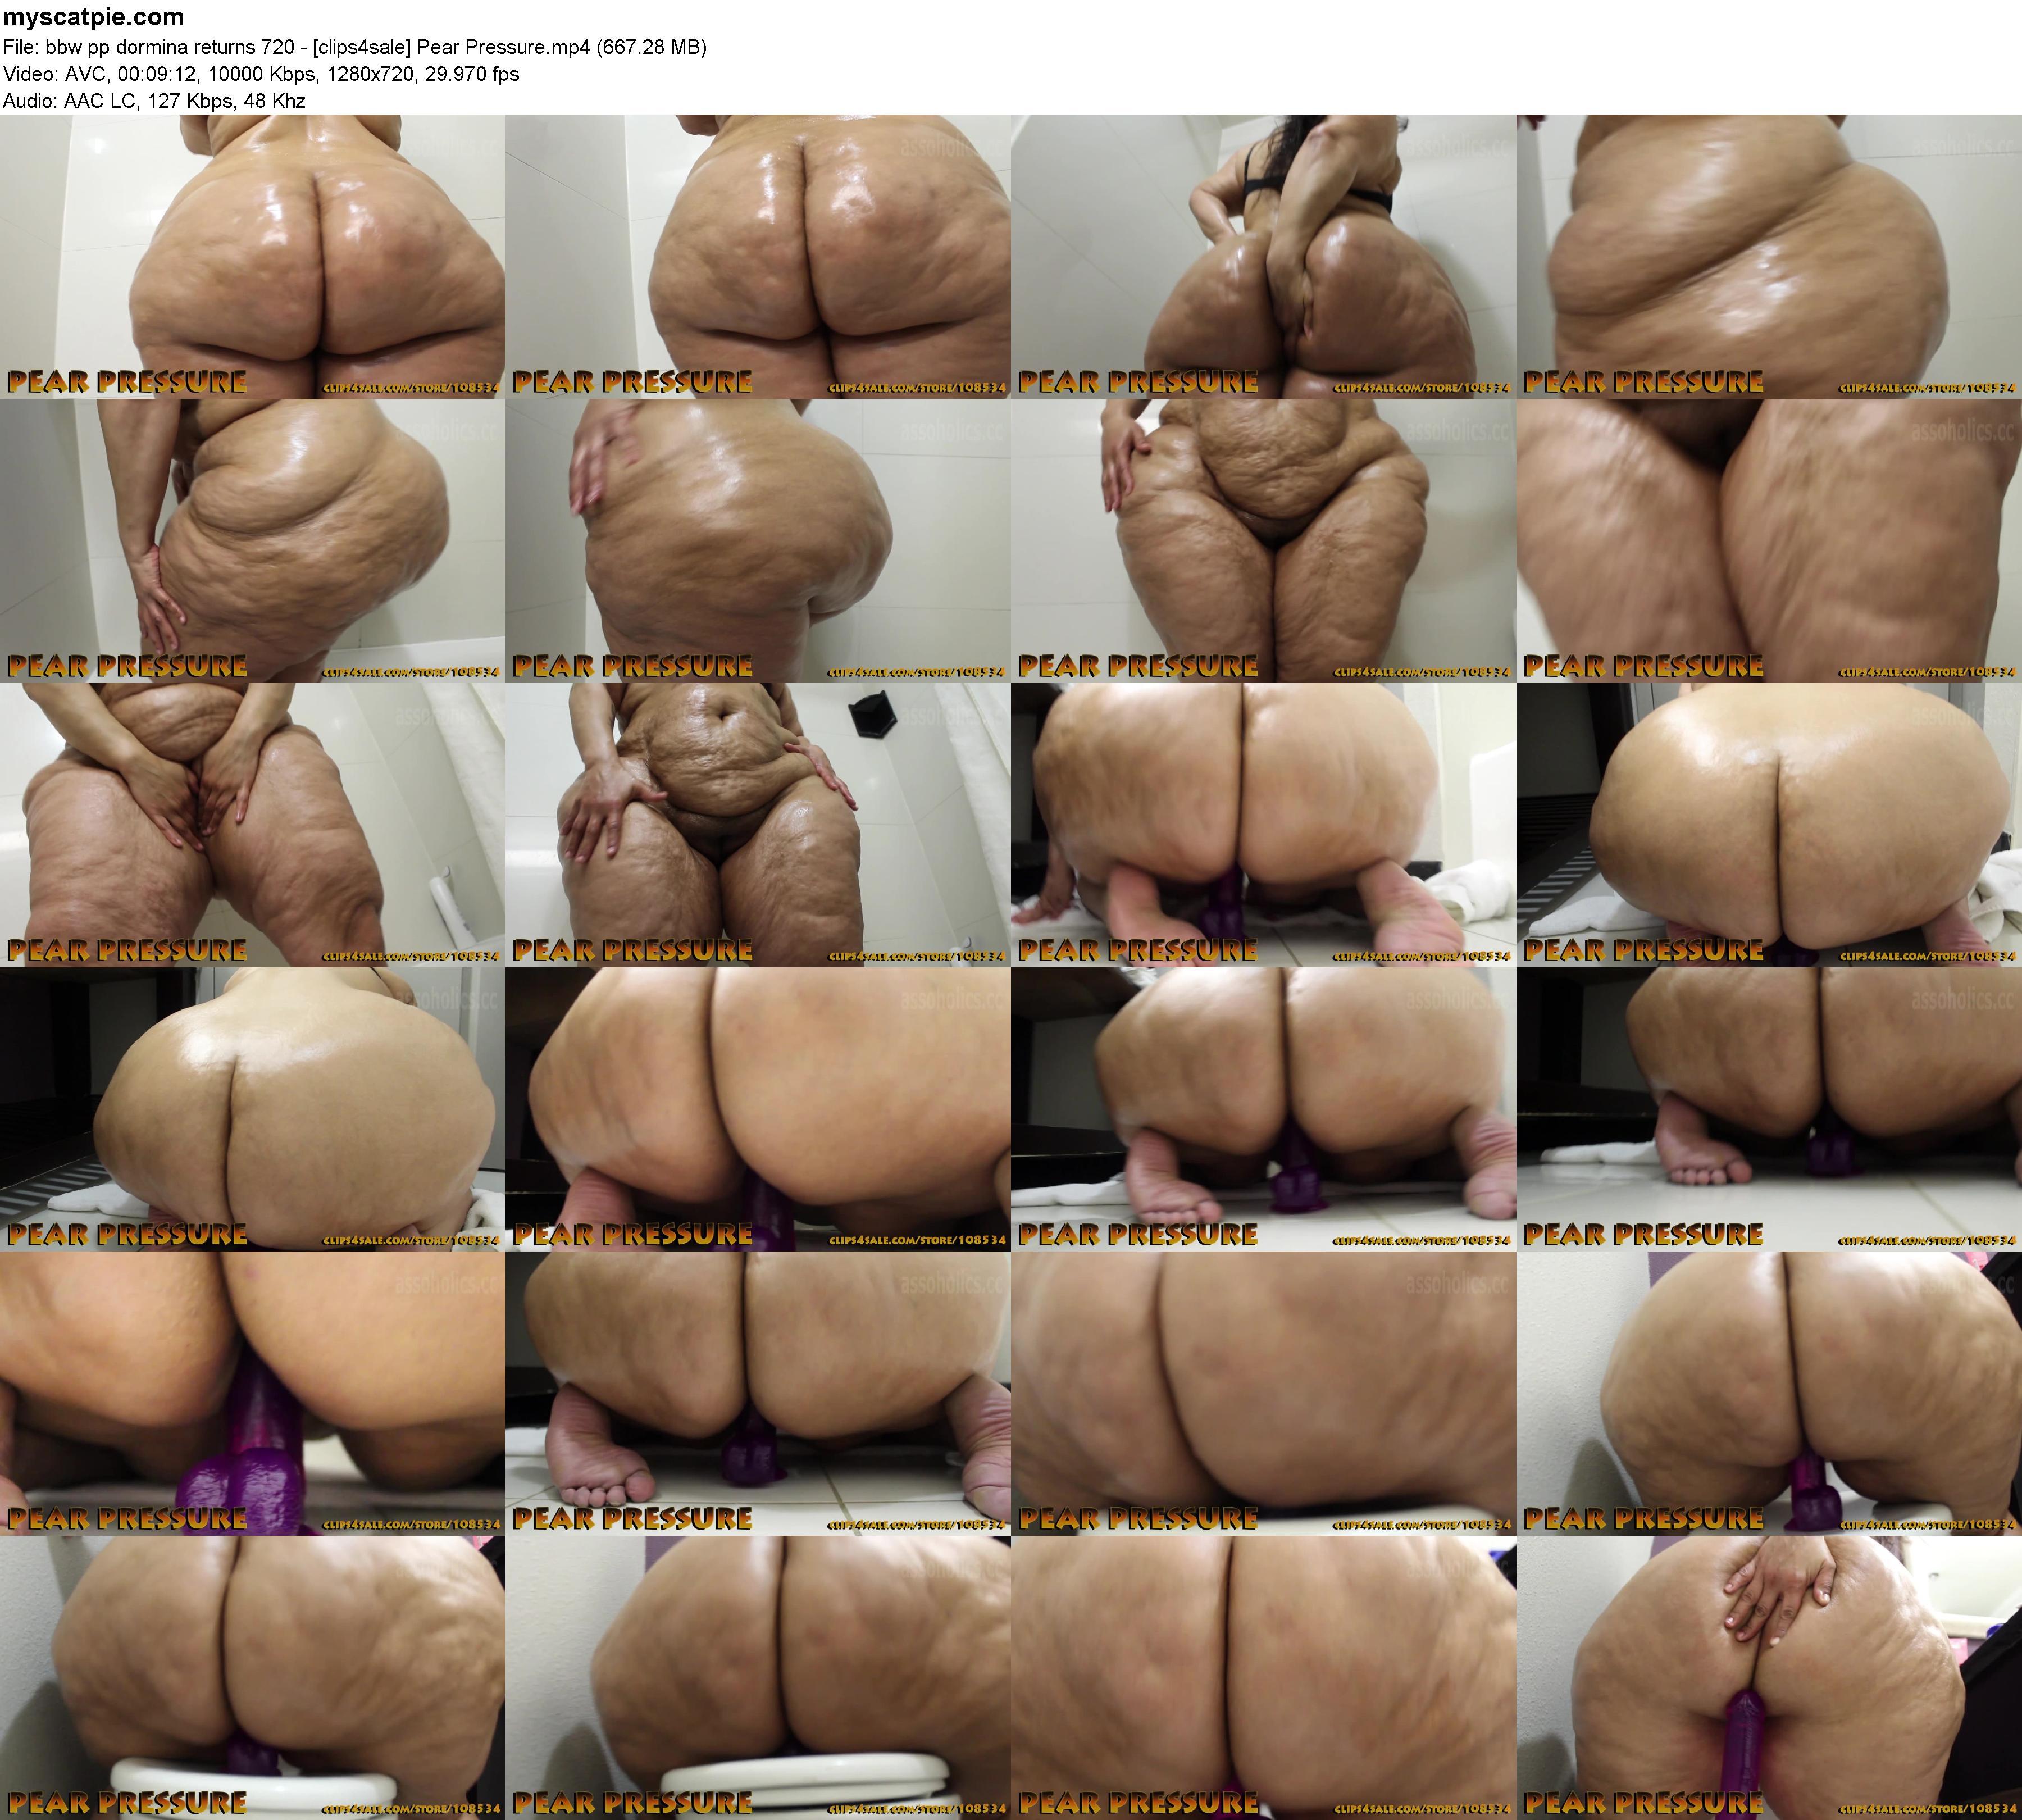 Alpha Porn Bbw bbw pp dormina returns 720 - [clips4sale] pear pressure (mp4